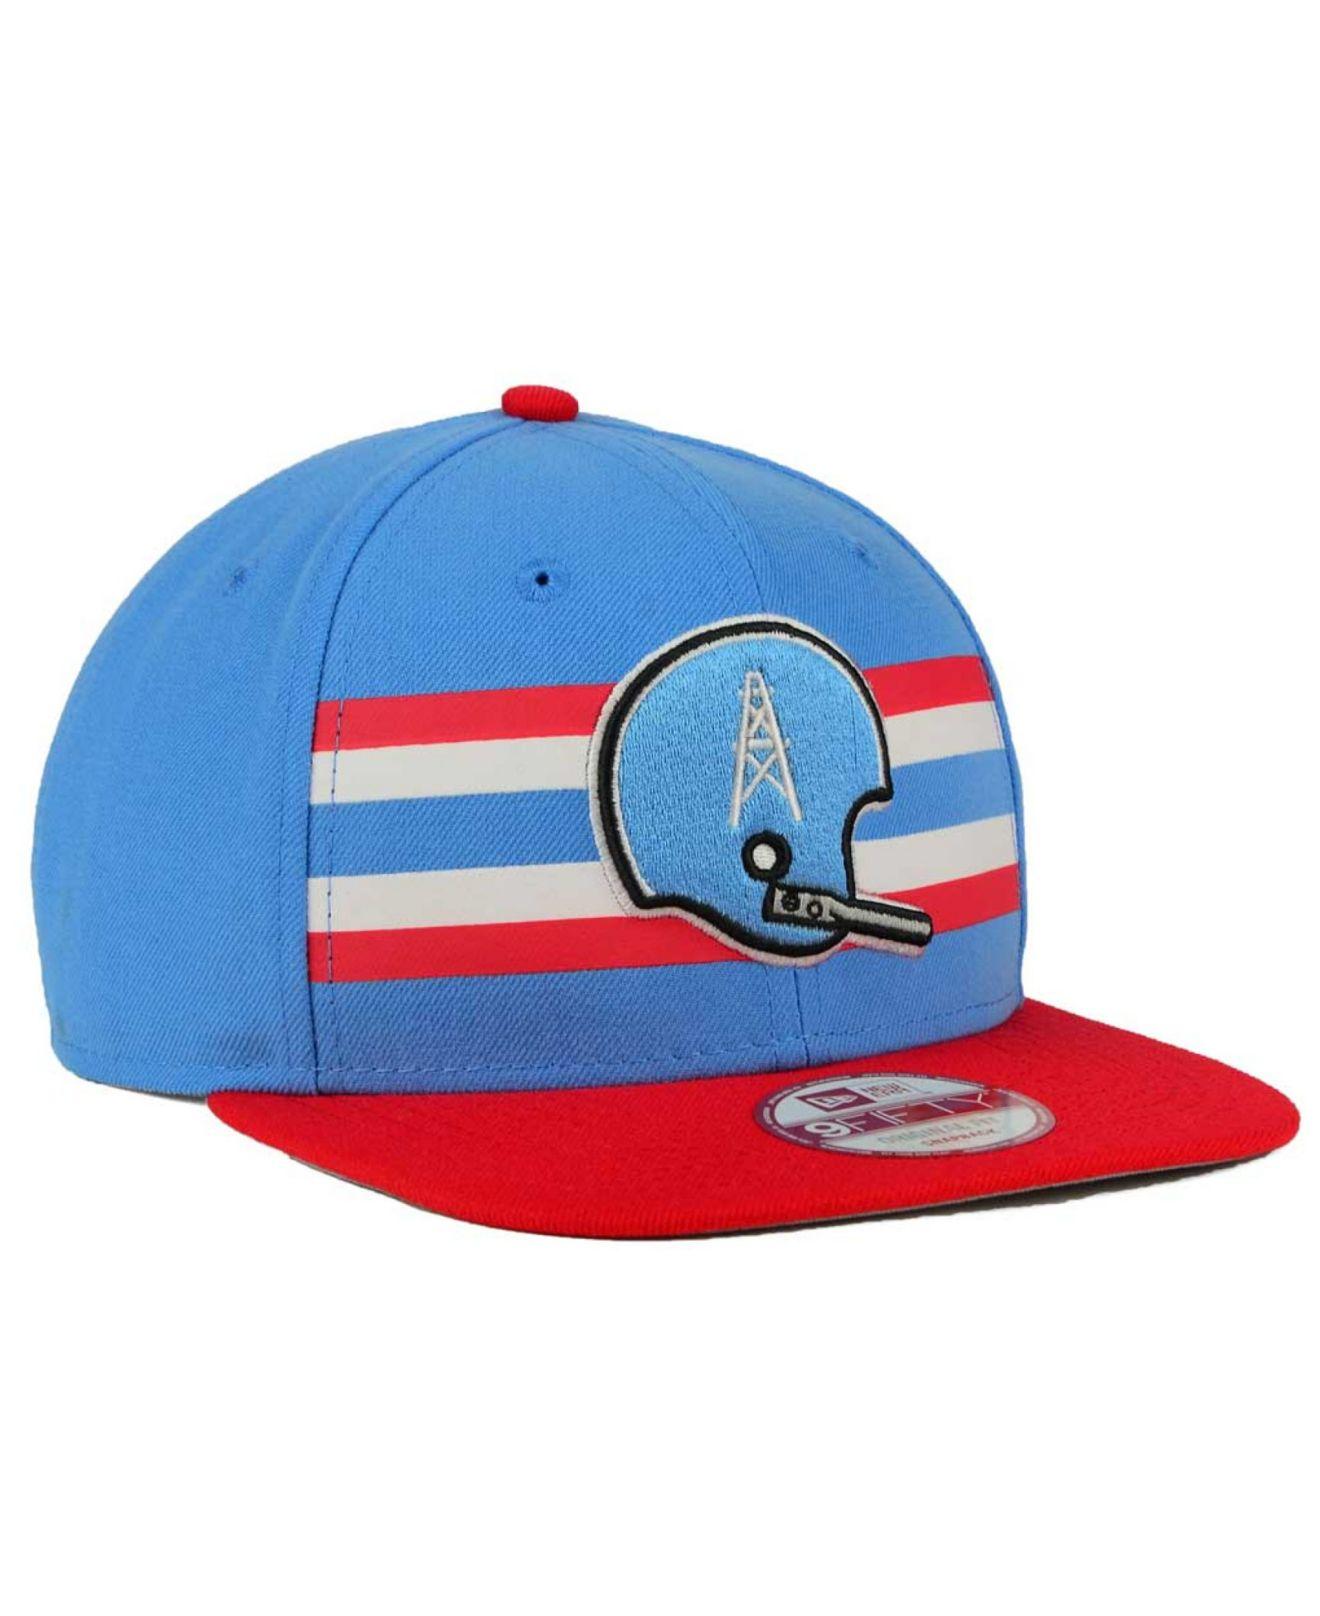 Lyst - KTZ Houston Oilers Retro Striped 9fifty Snapback Cap in Blue ... e4a9a2062